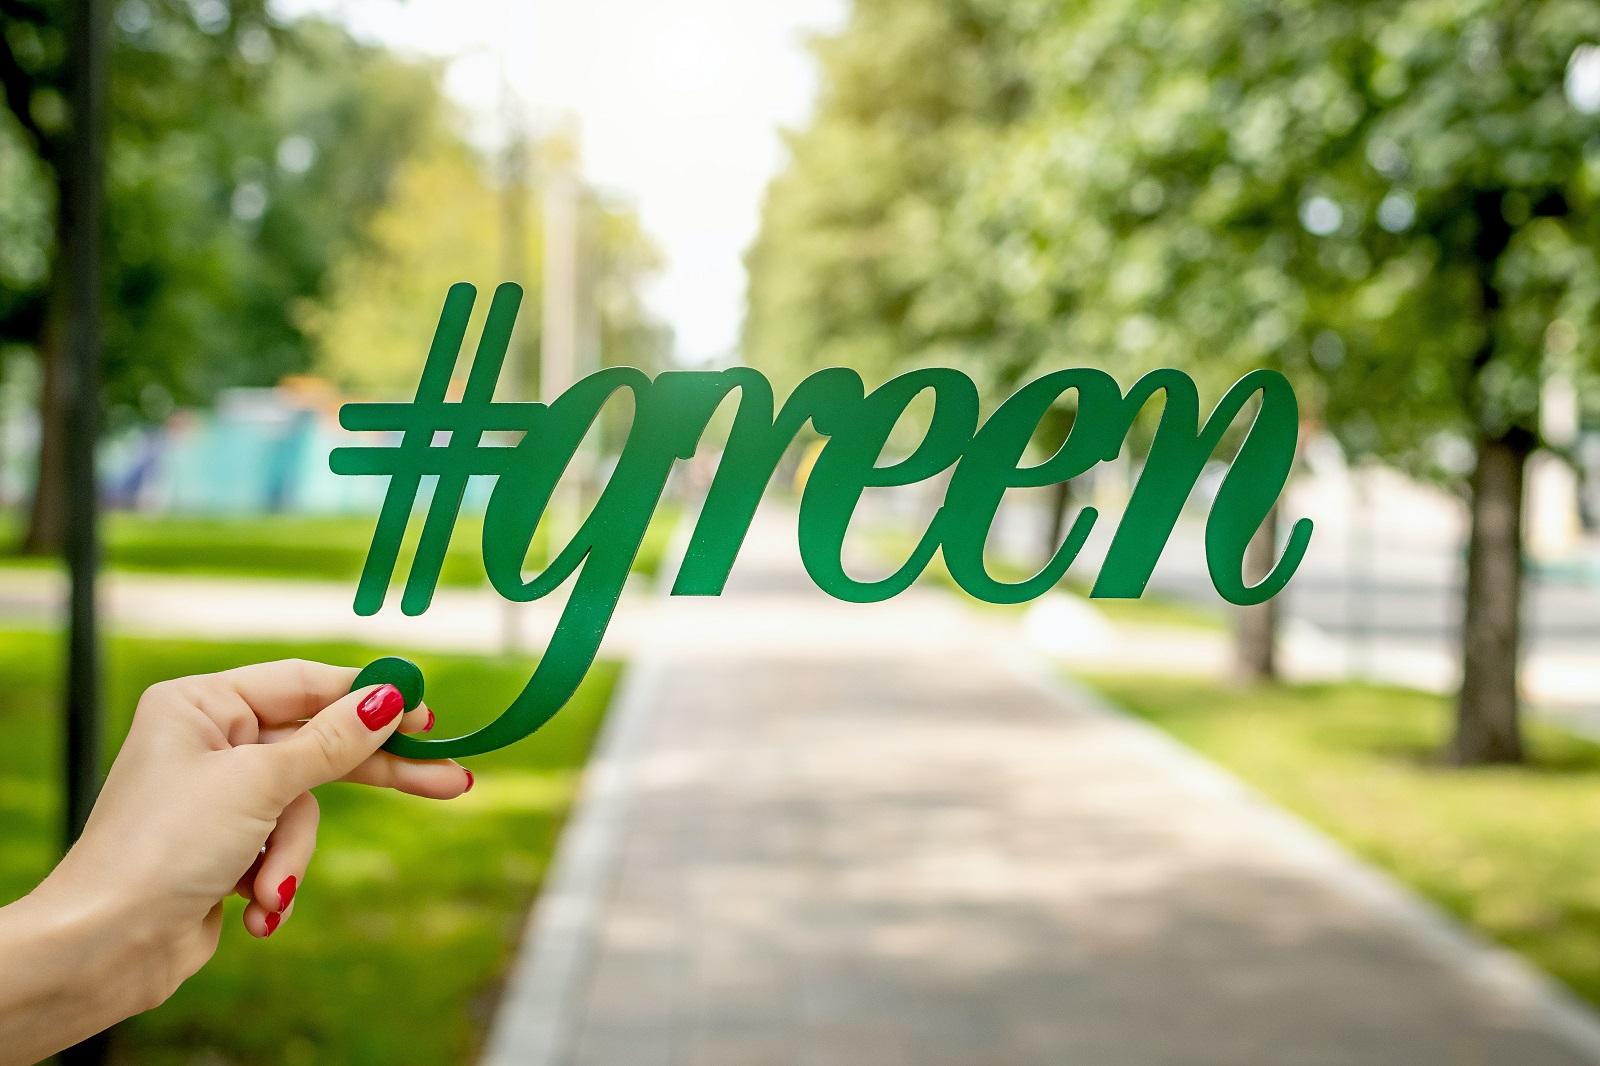 Business recycling program go green